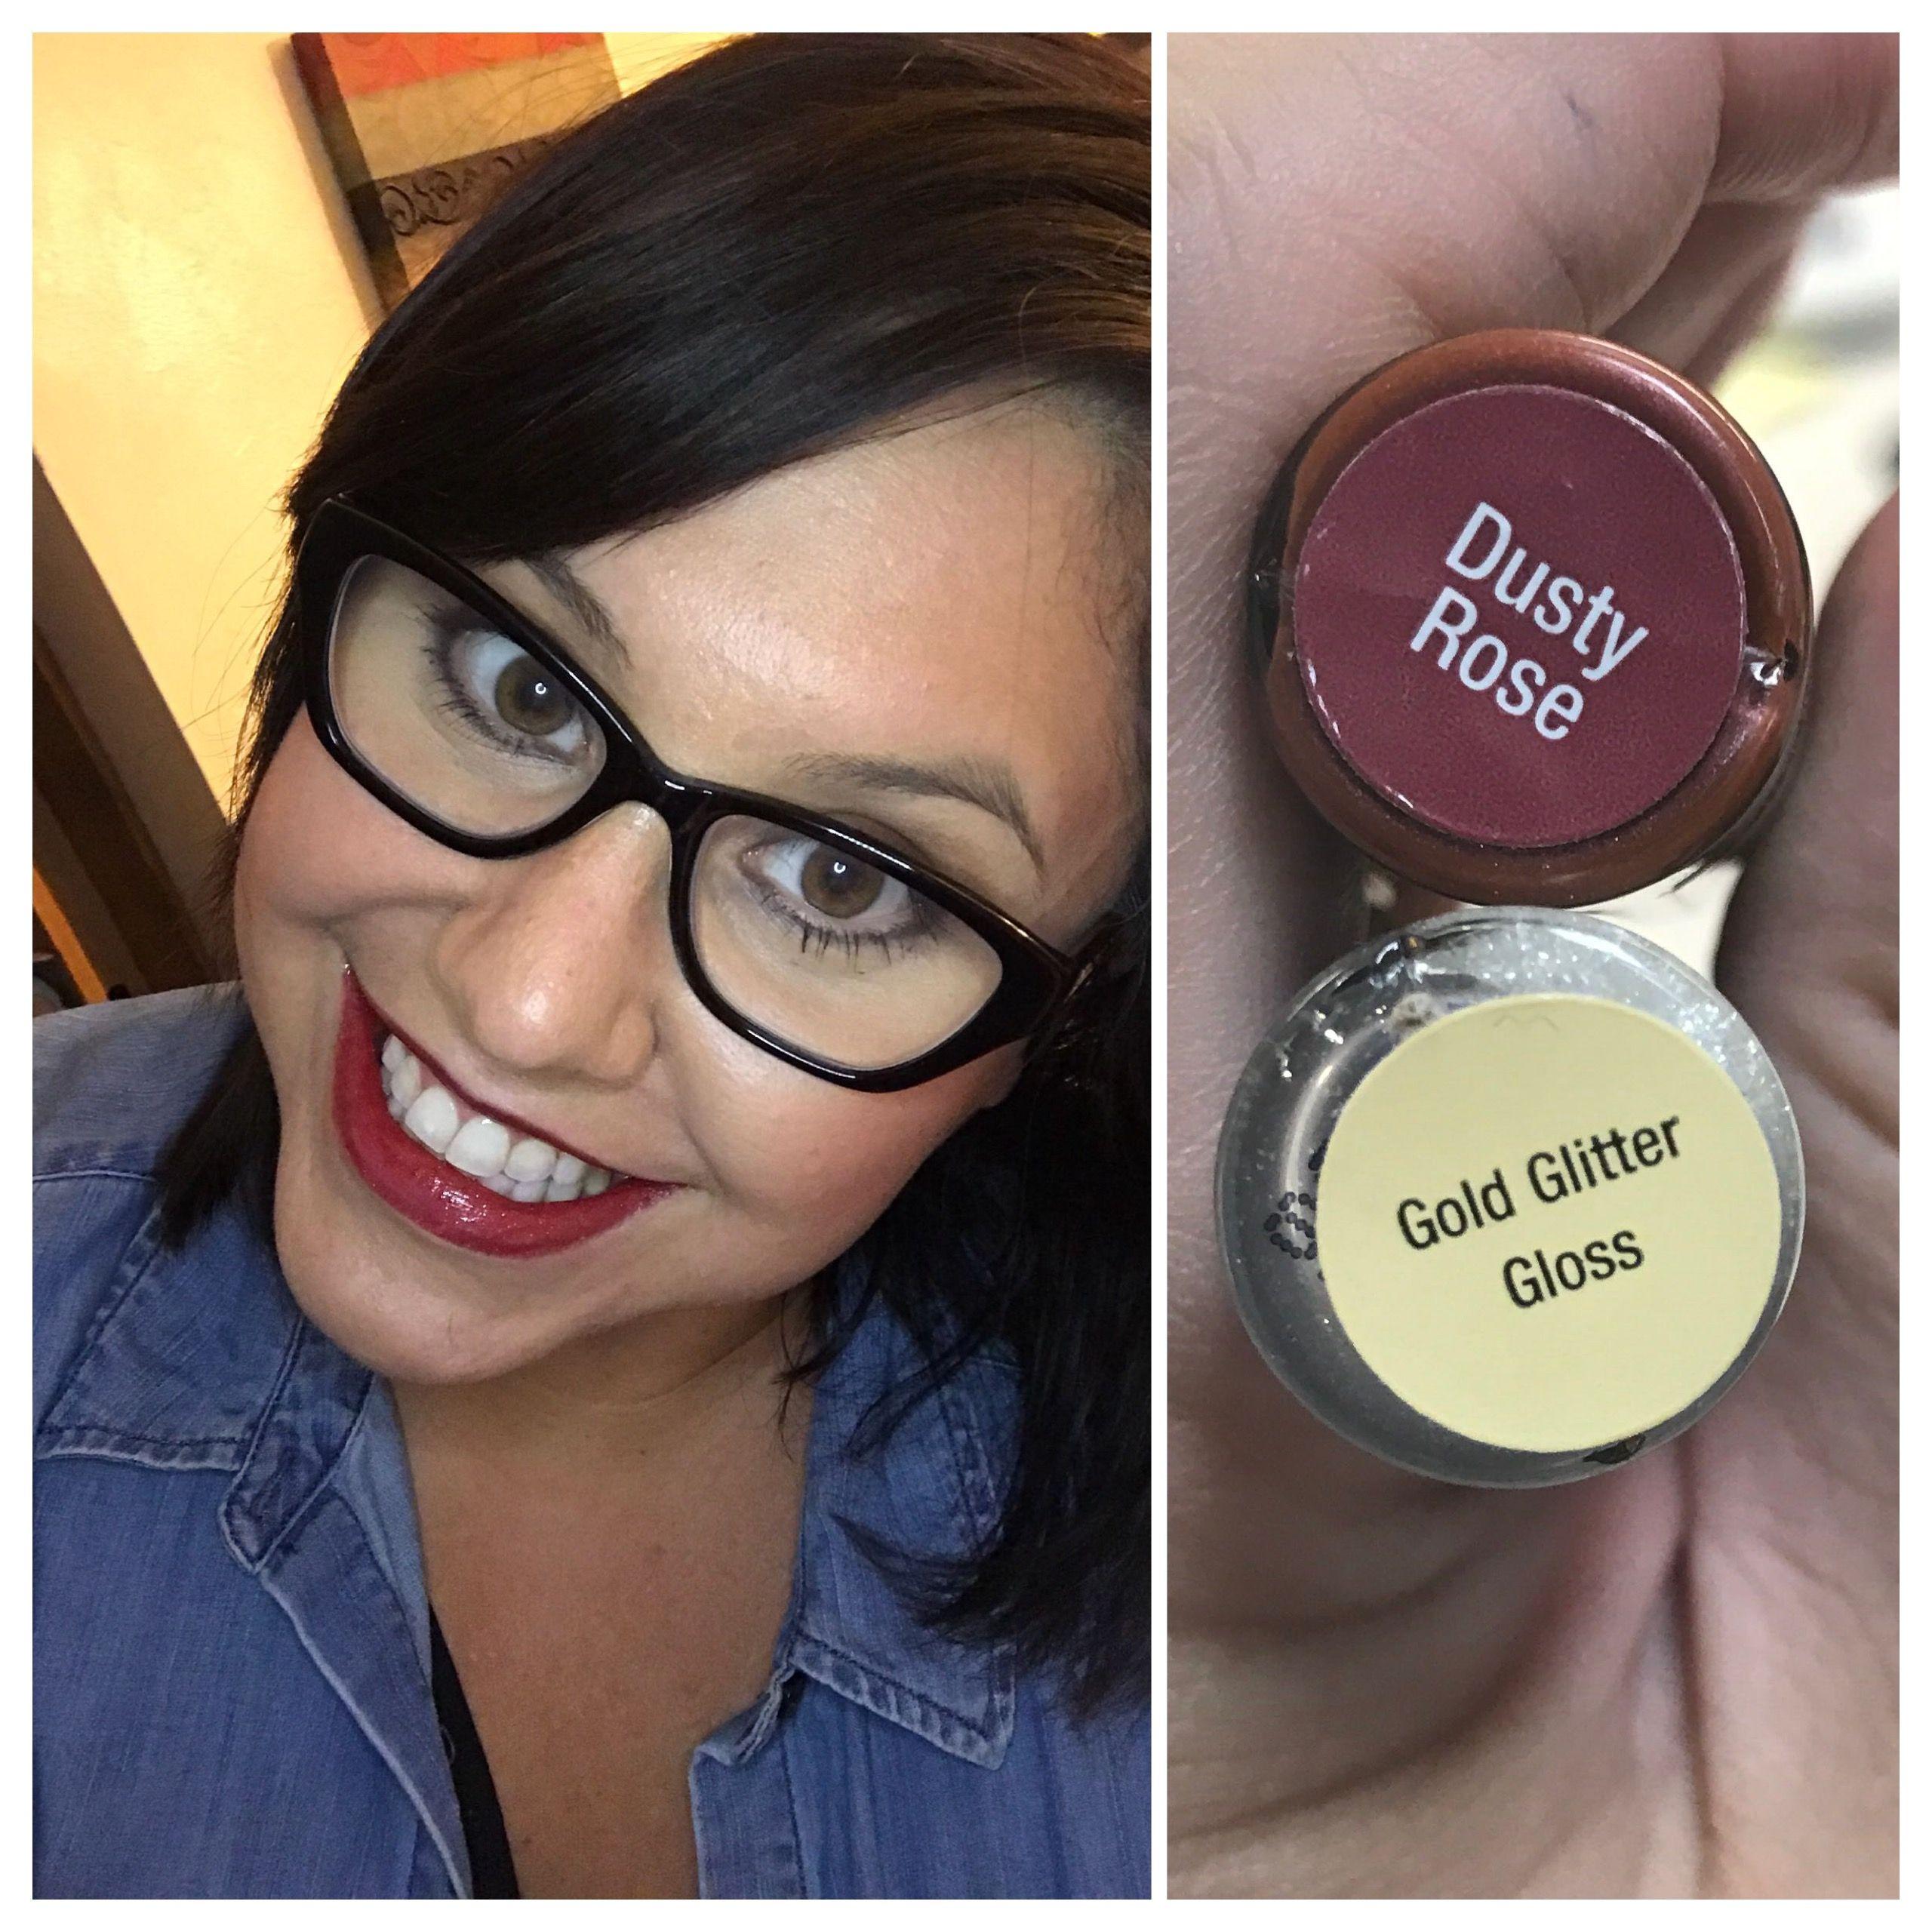 Dusty Rose LipSense  Distributor 270962